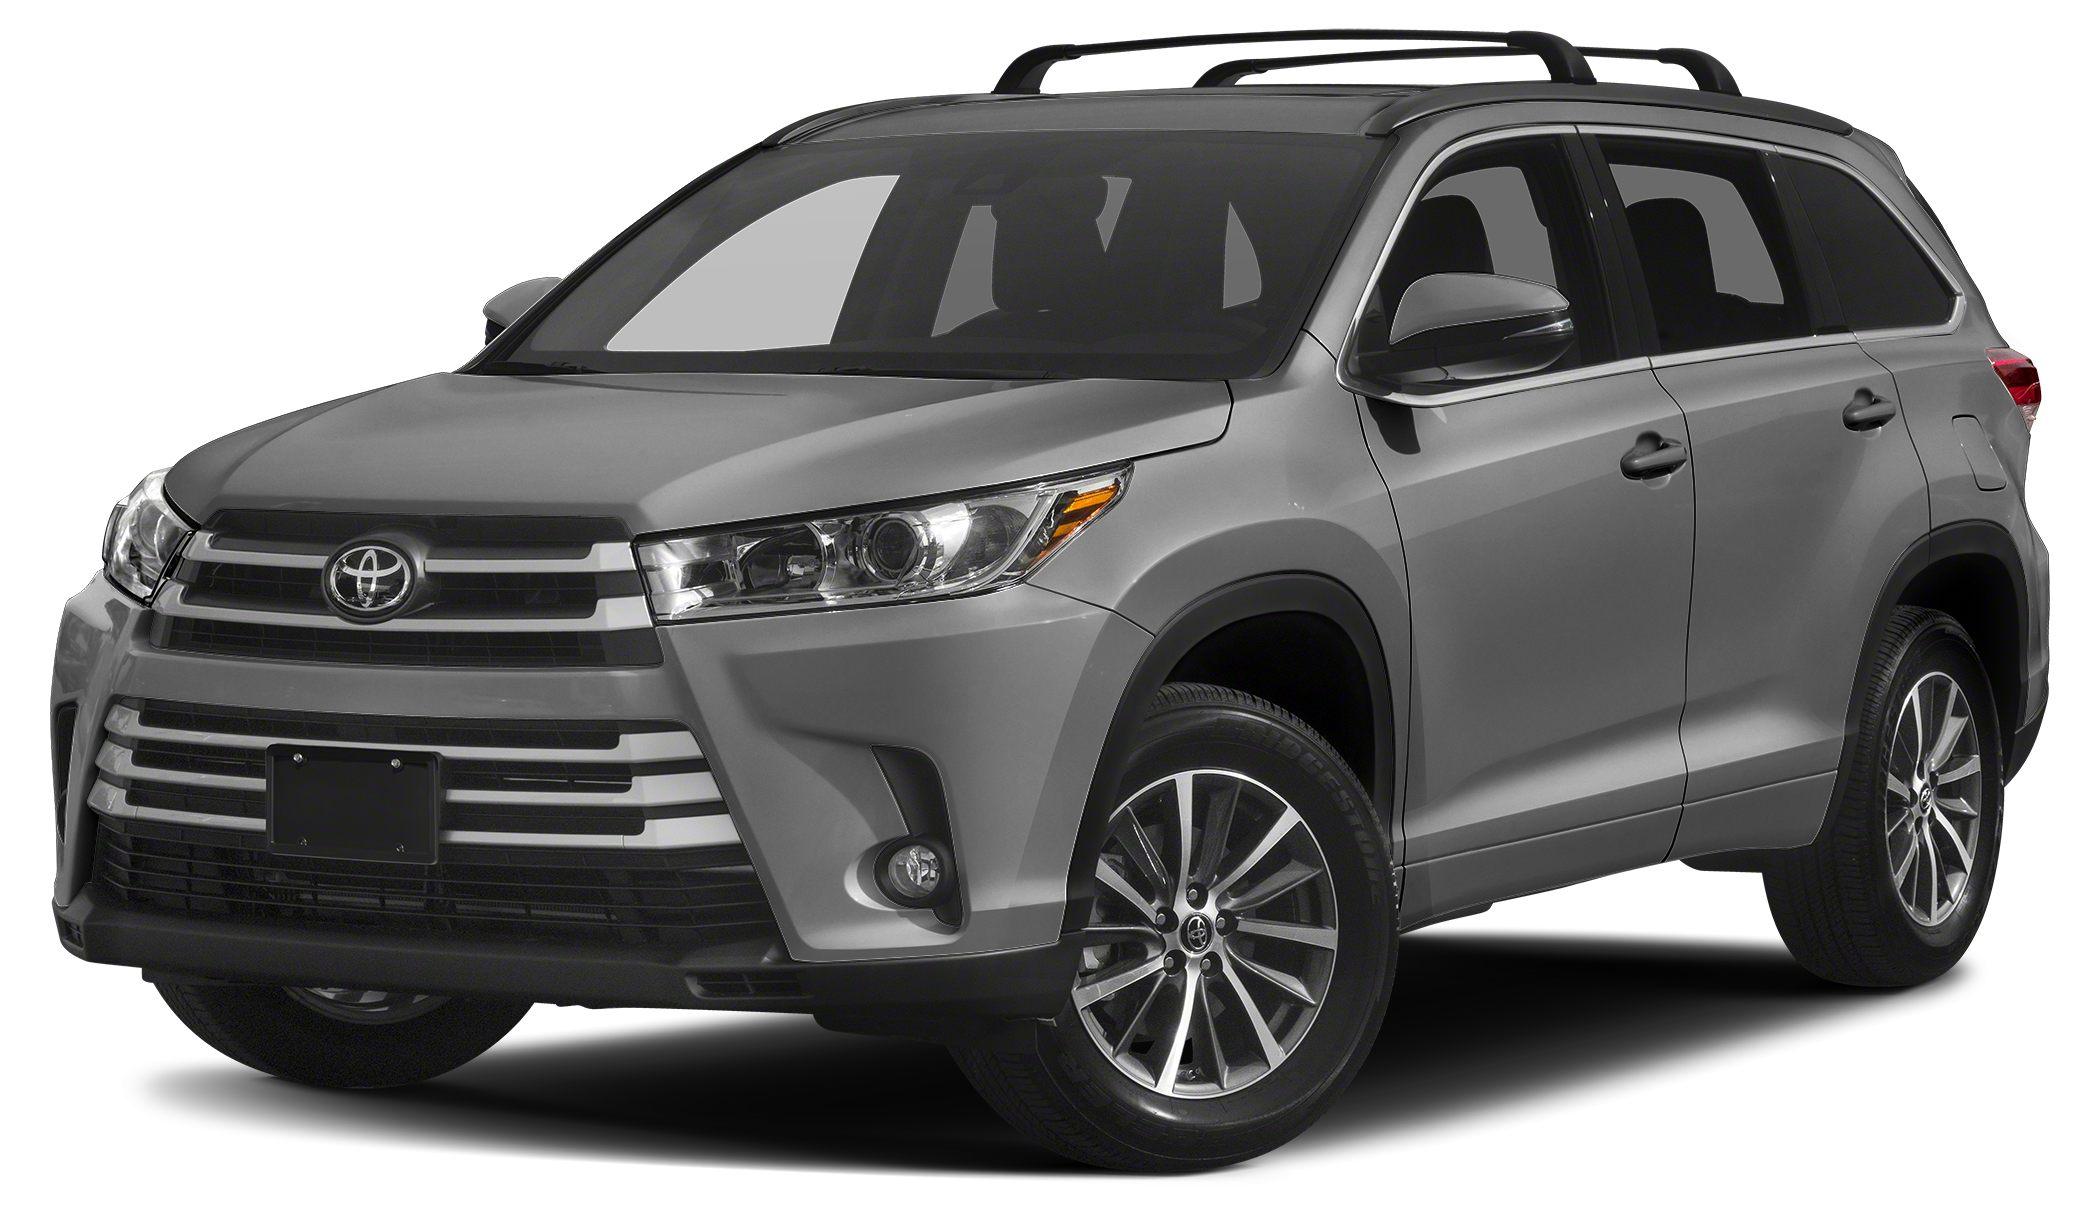 2017 Toyota Highlander XLE XLE trim CARFAX 1-Owner ONLY 10142 Miles EPA 26 MPG Hwy20 MPG City